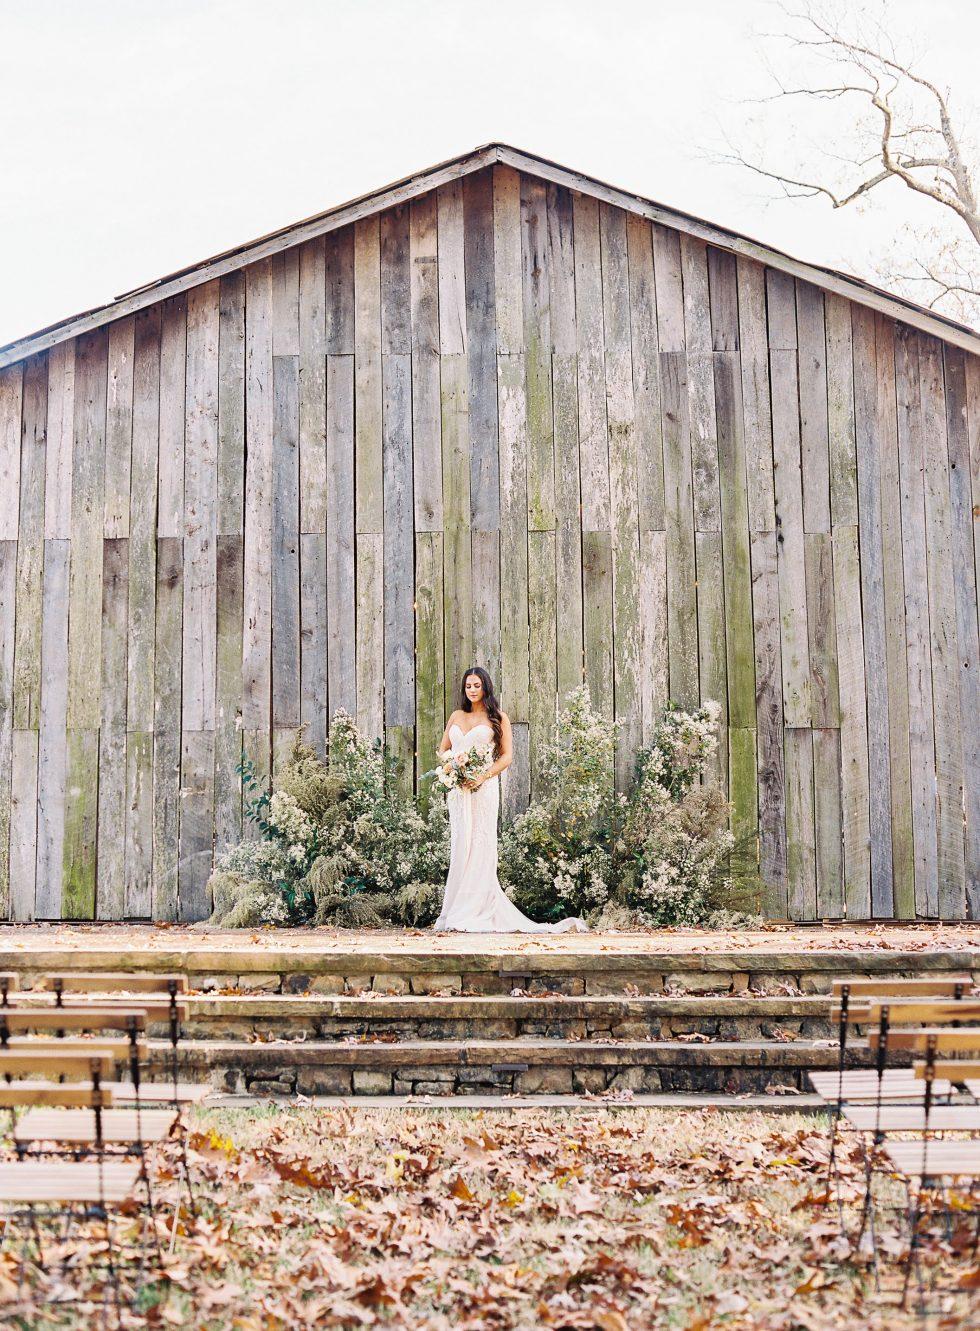 Summerfield-Farms-Outdoor-Fall-Wedding031